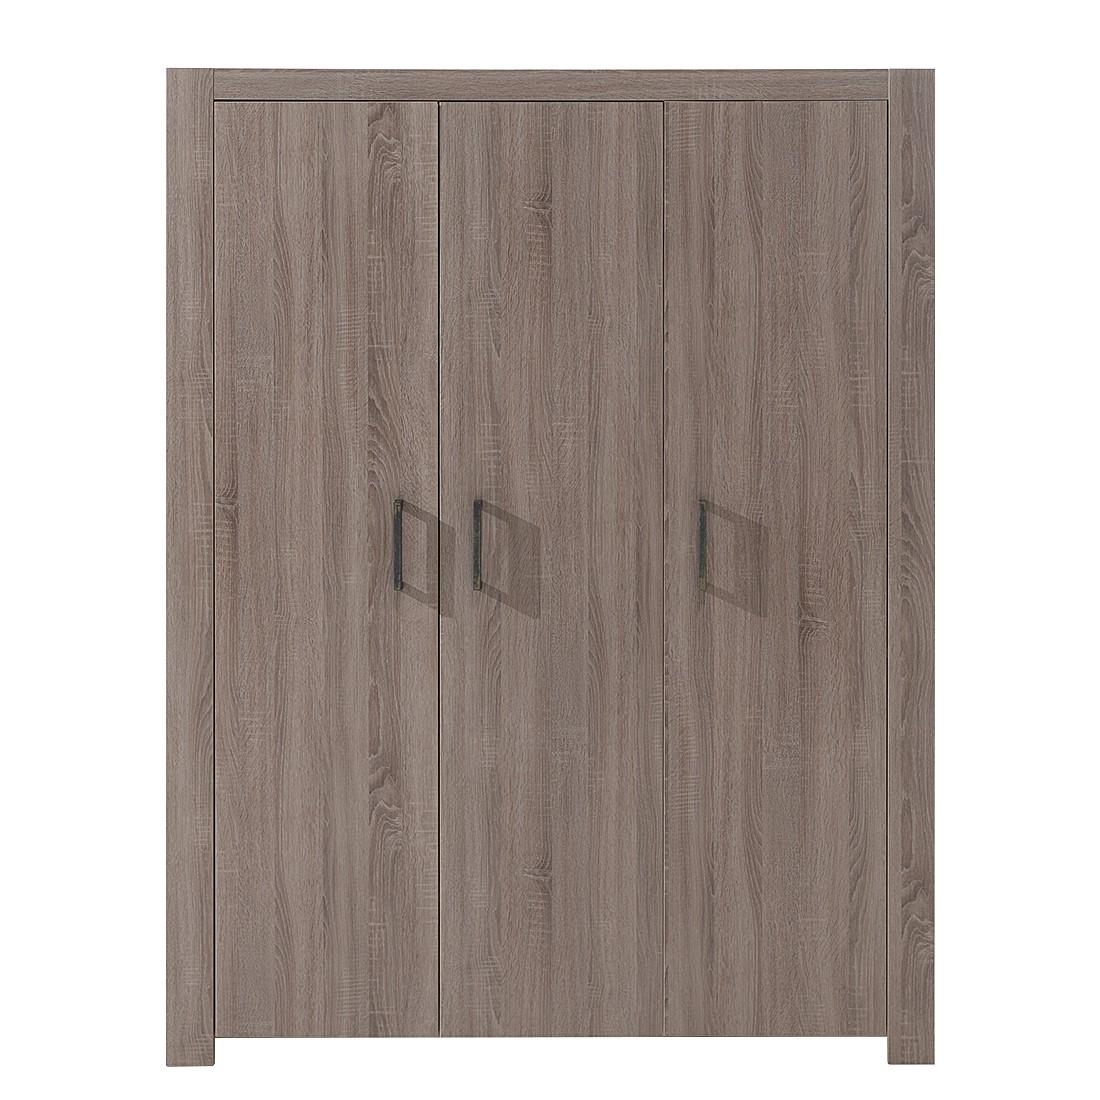 kleiderschrank lucas 3 trg eiche sonoma tr ffel dekor vipack g nstig. Black Bedroom Furniture Sets. Home Design Ideas